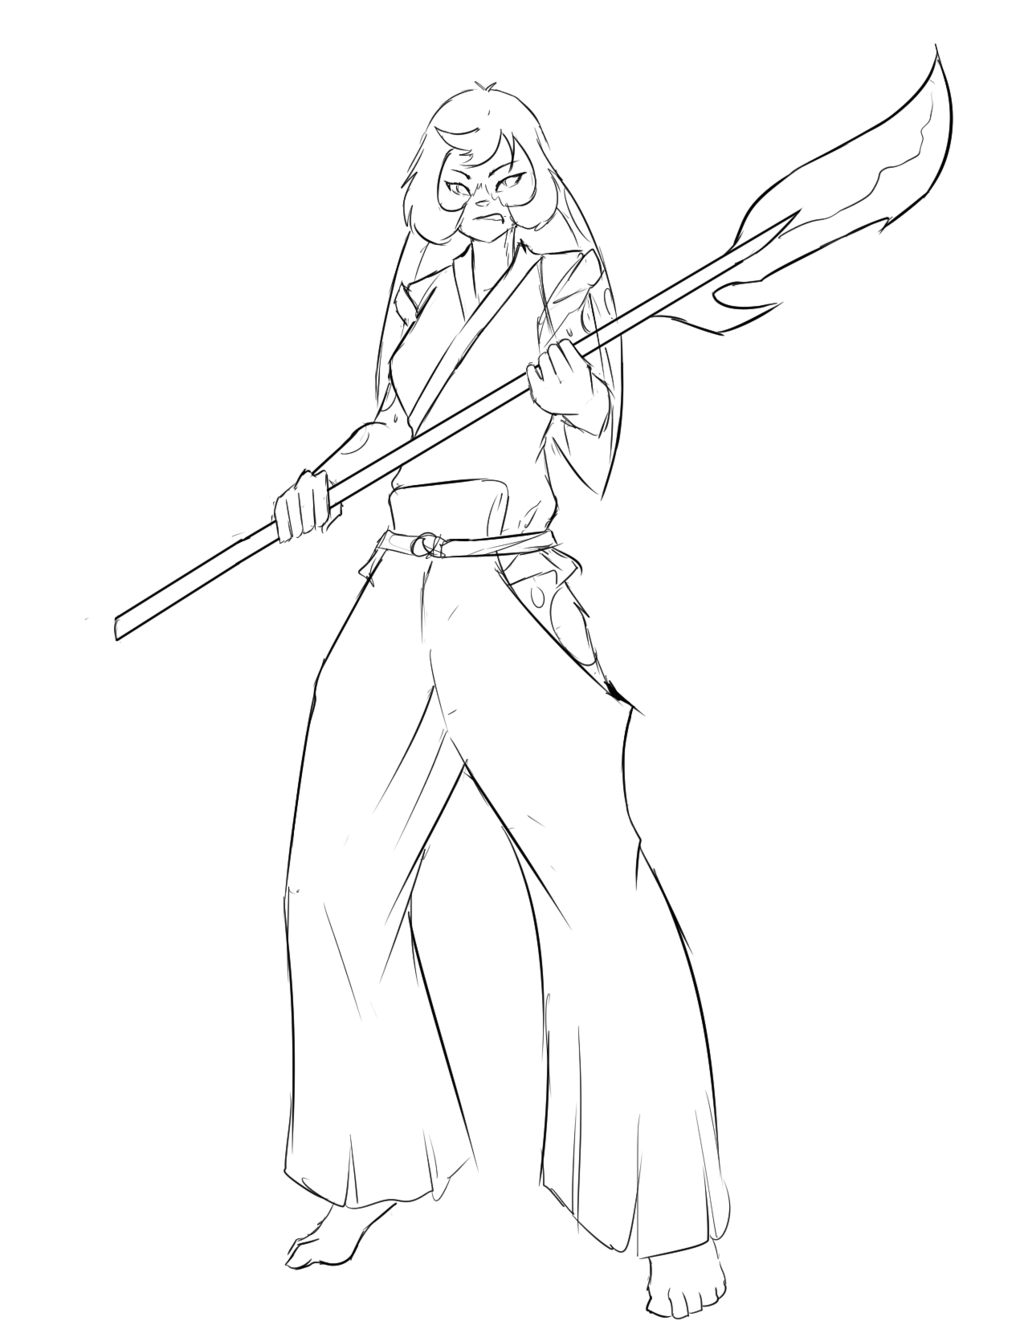 Warrior Lady TangoBunny!